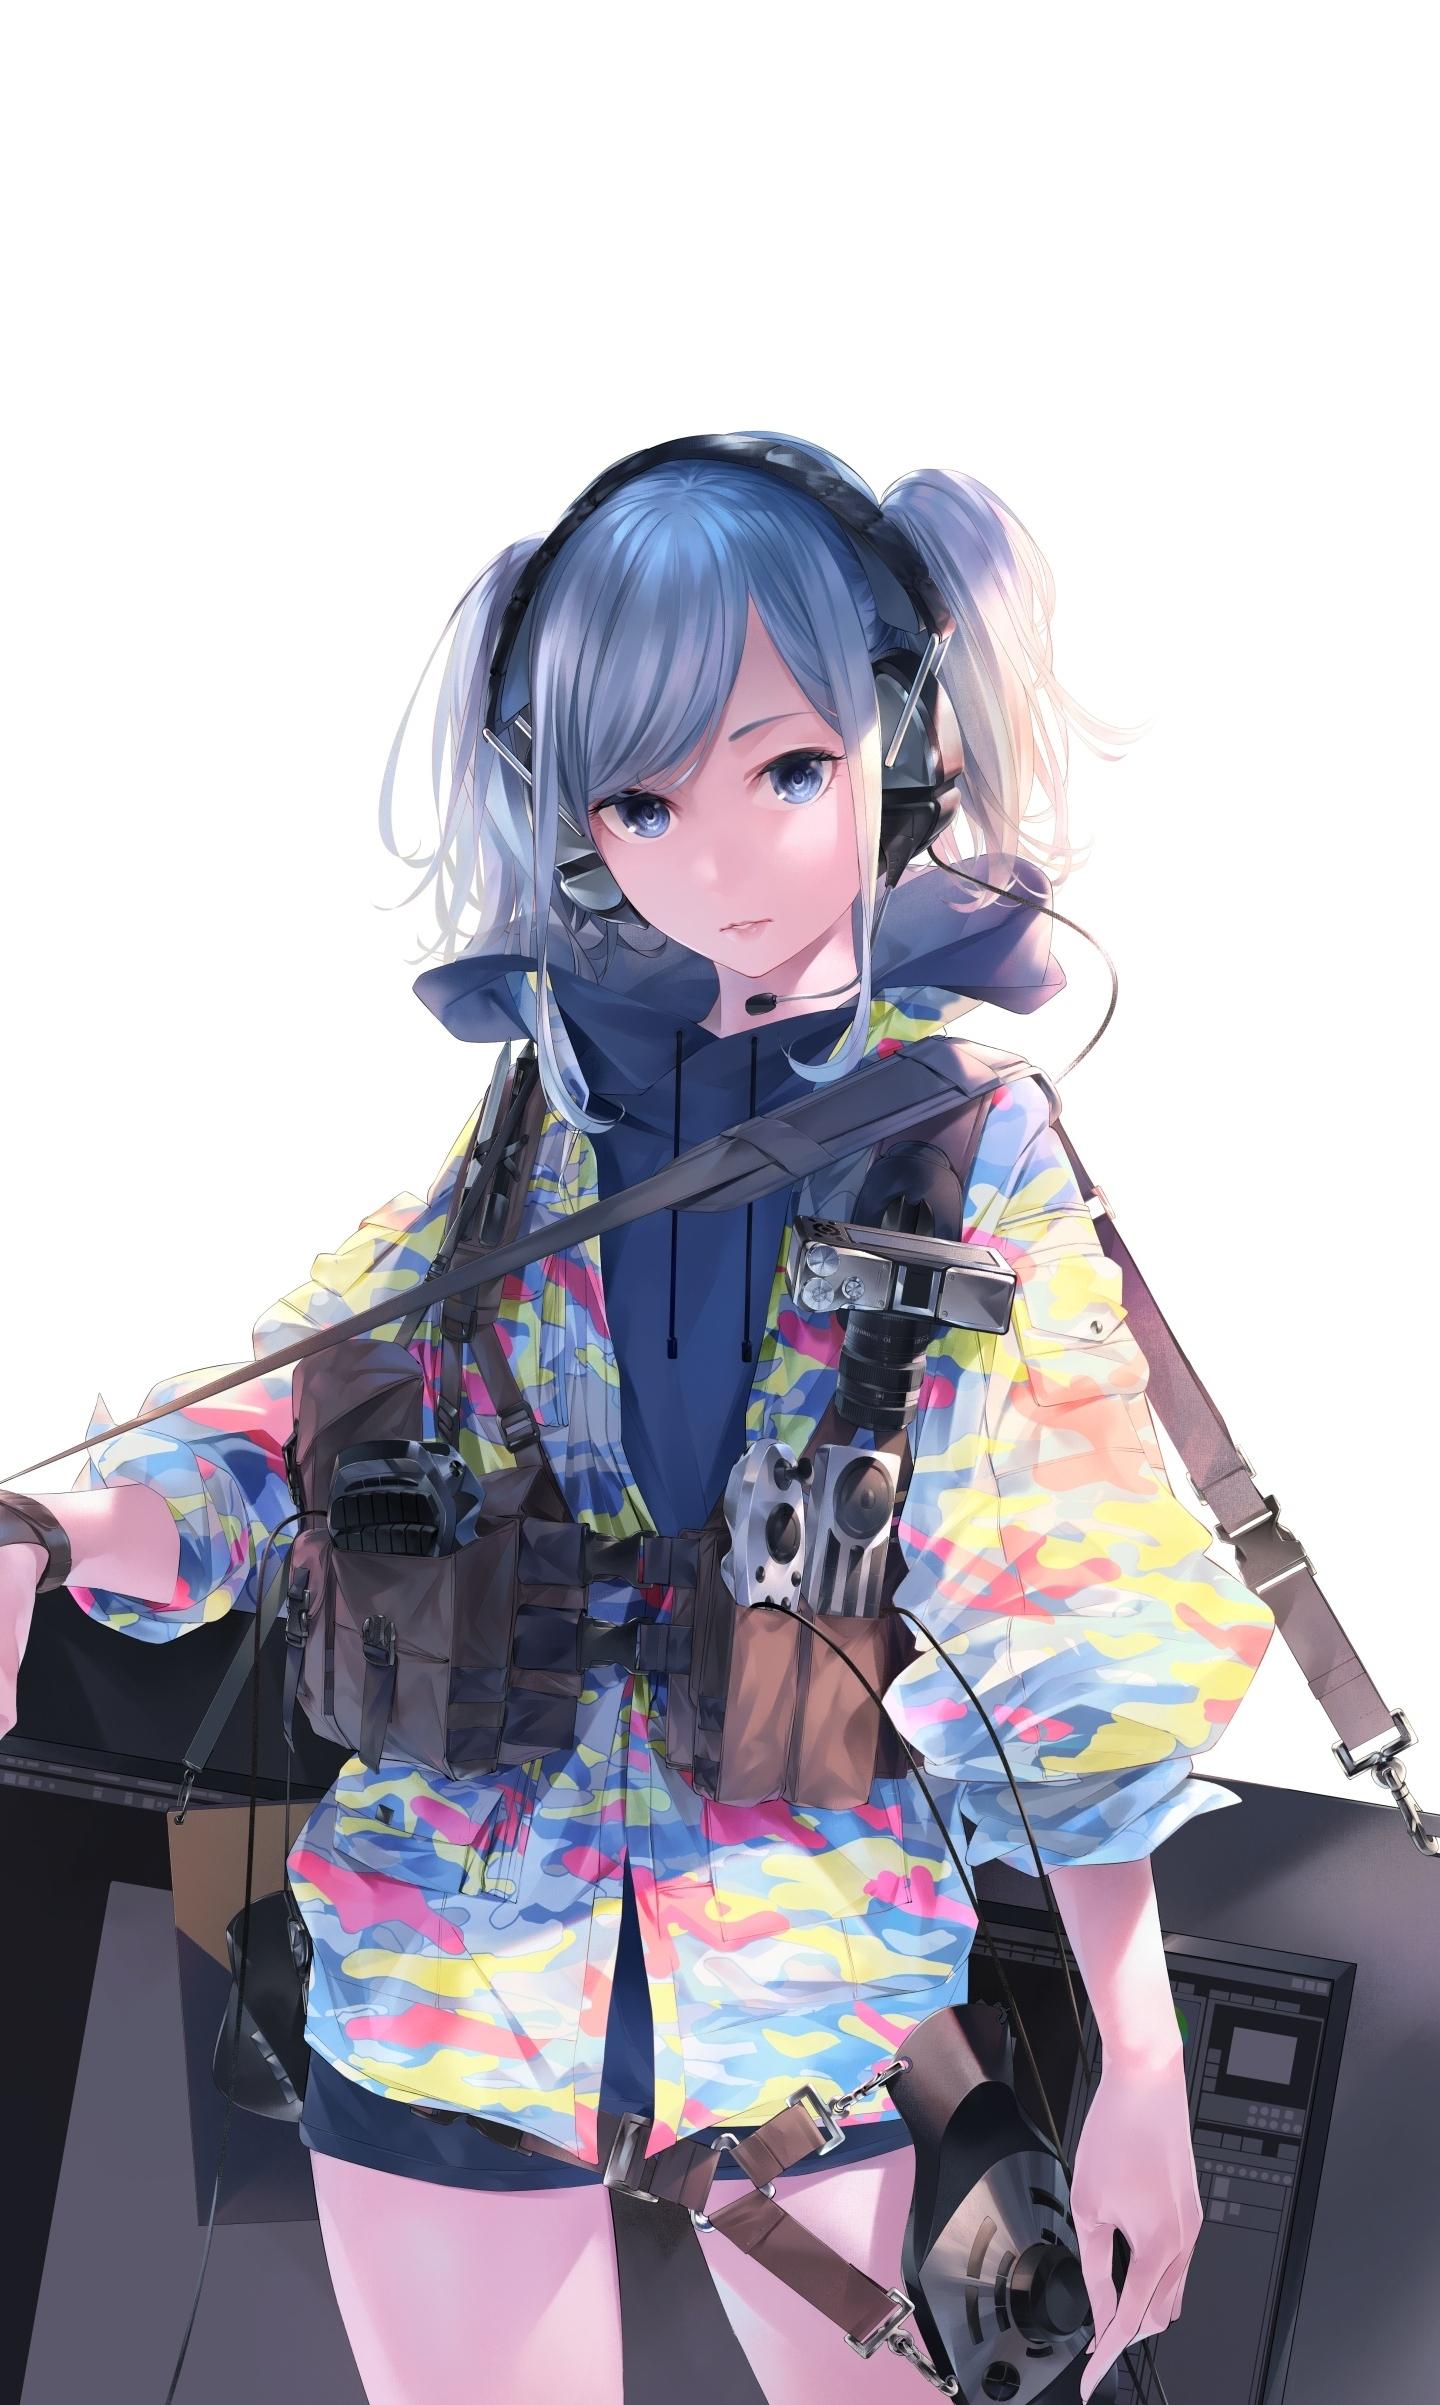 Anime Girl Cool With Jacket - Anime Wallpapers